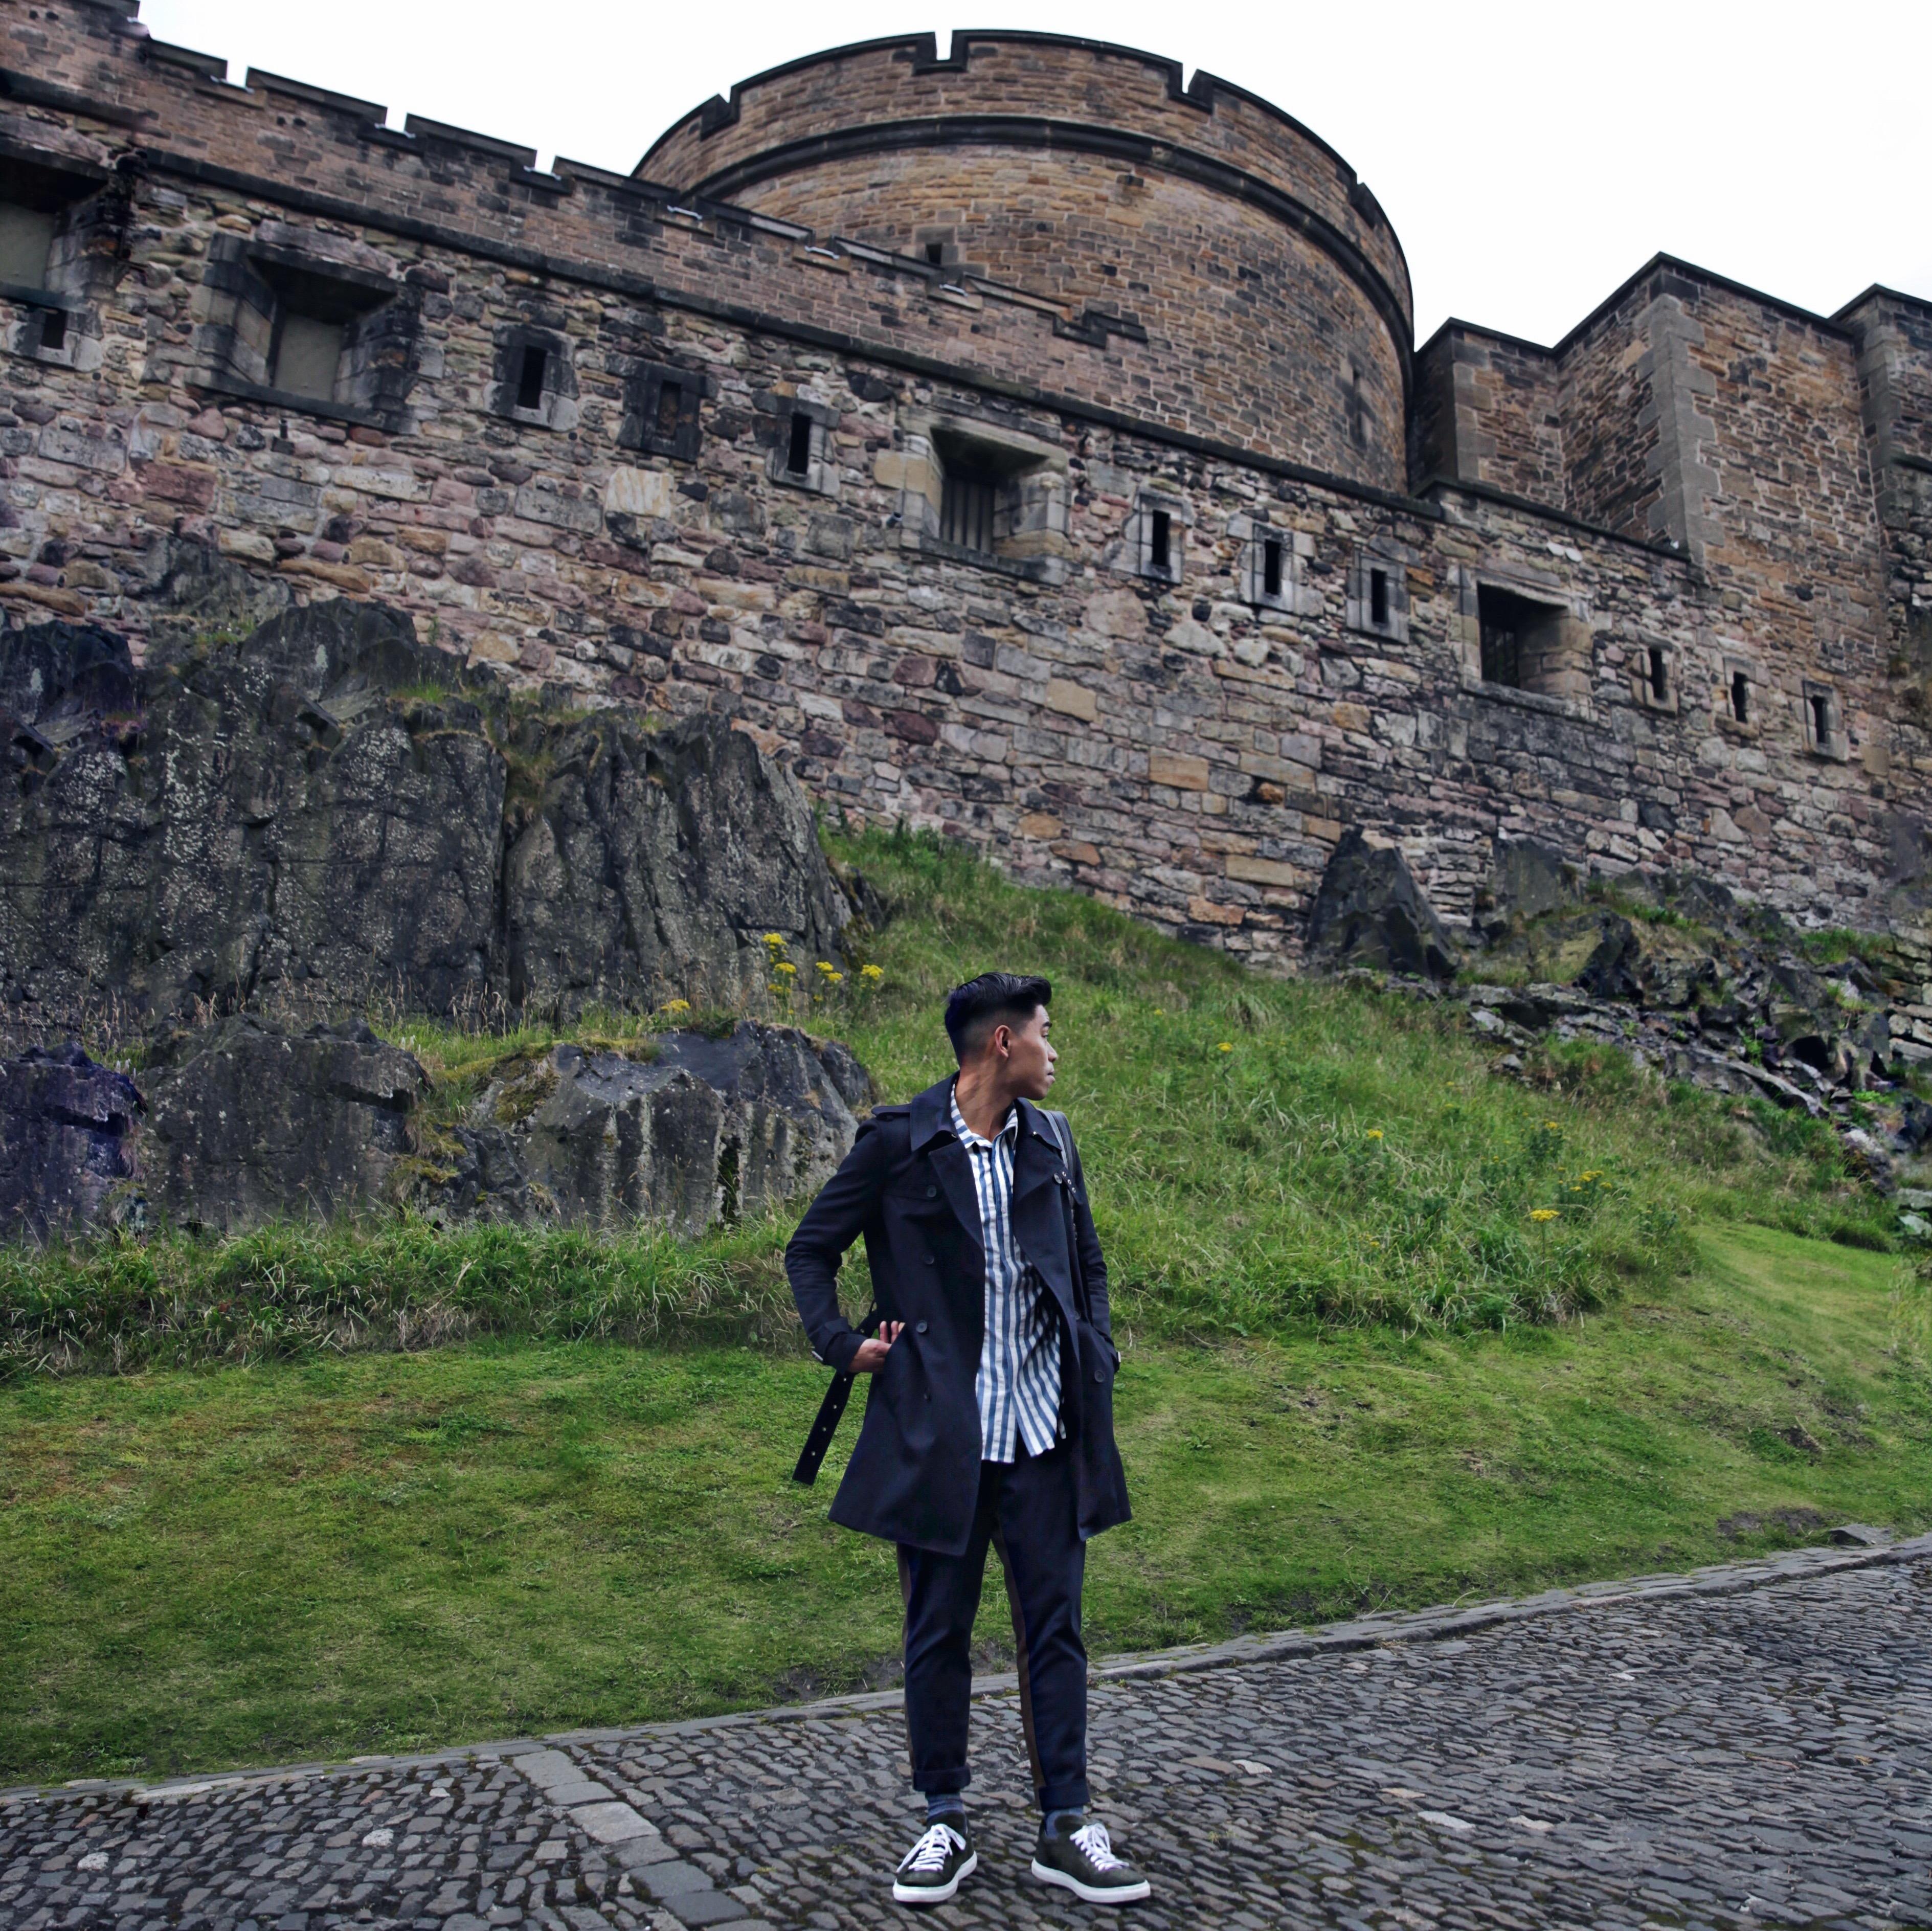 edinburgh castle visit scotland